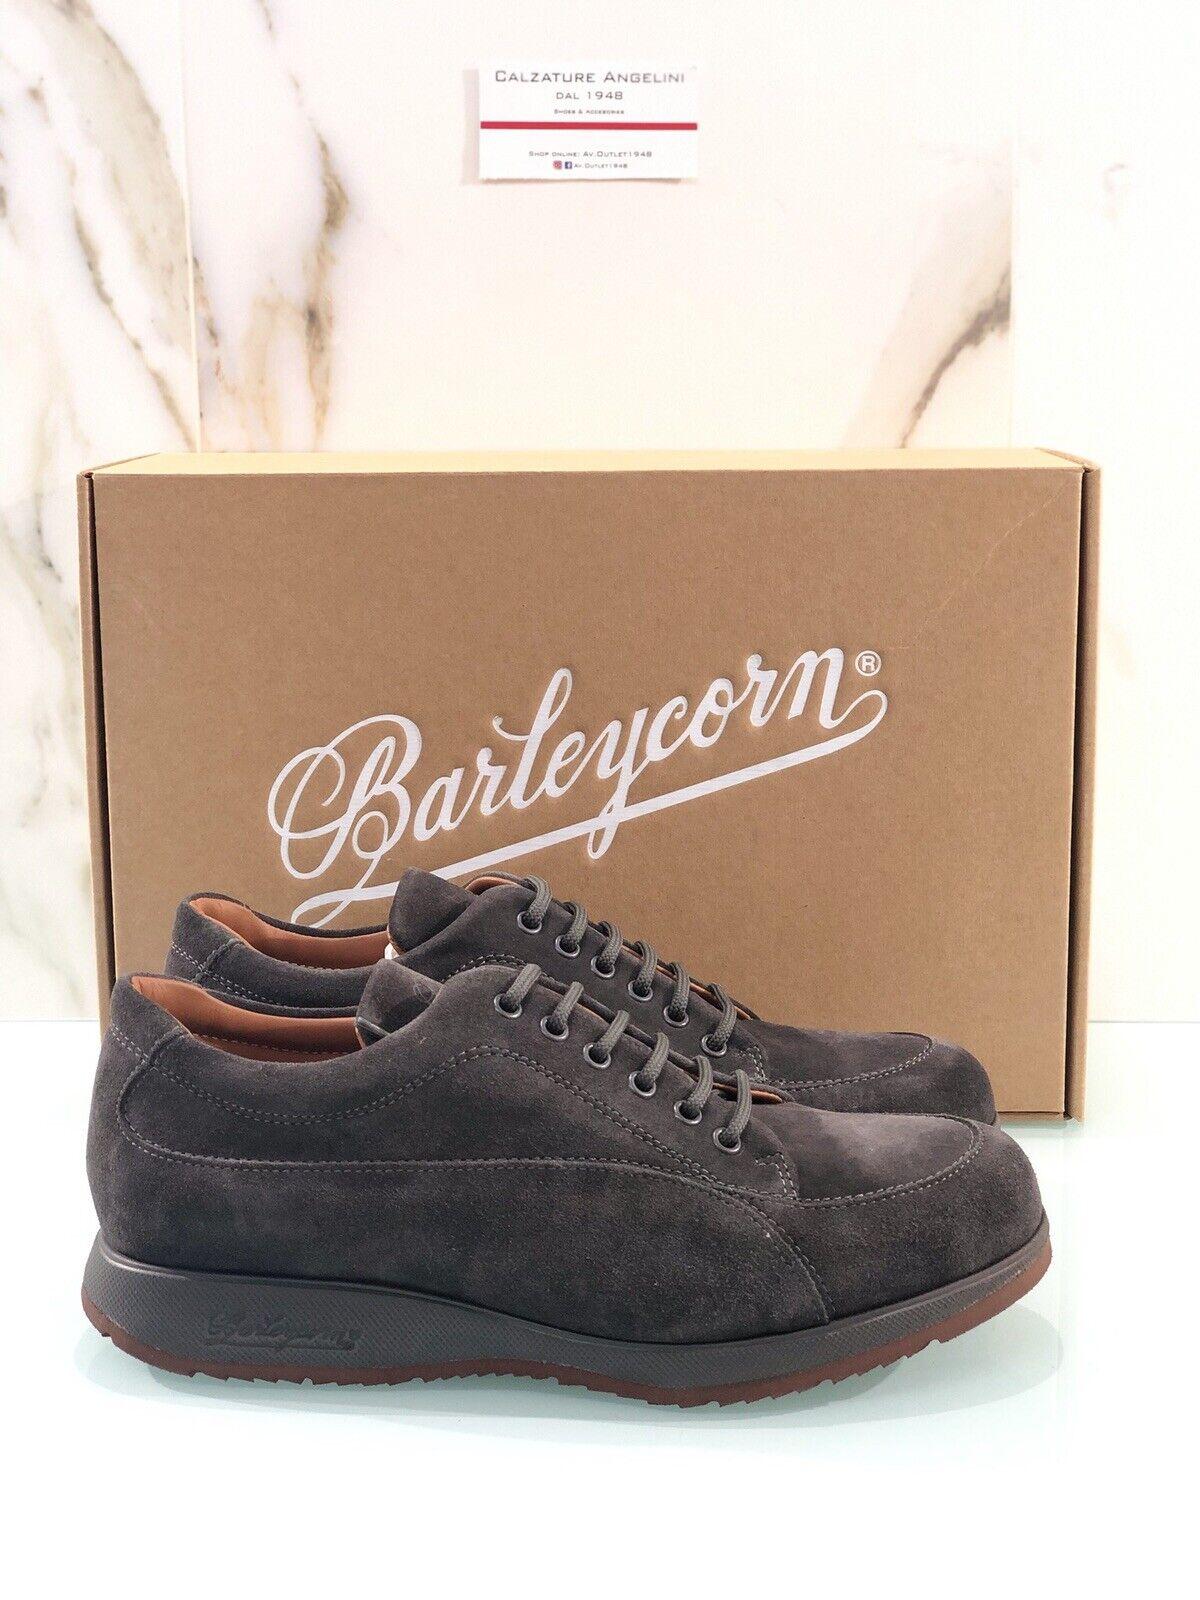 Barleycorn New Classic Herren Turnschuhe aus Wildleder Grau 41 Made in